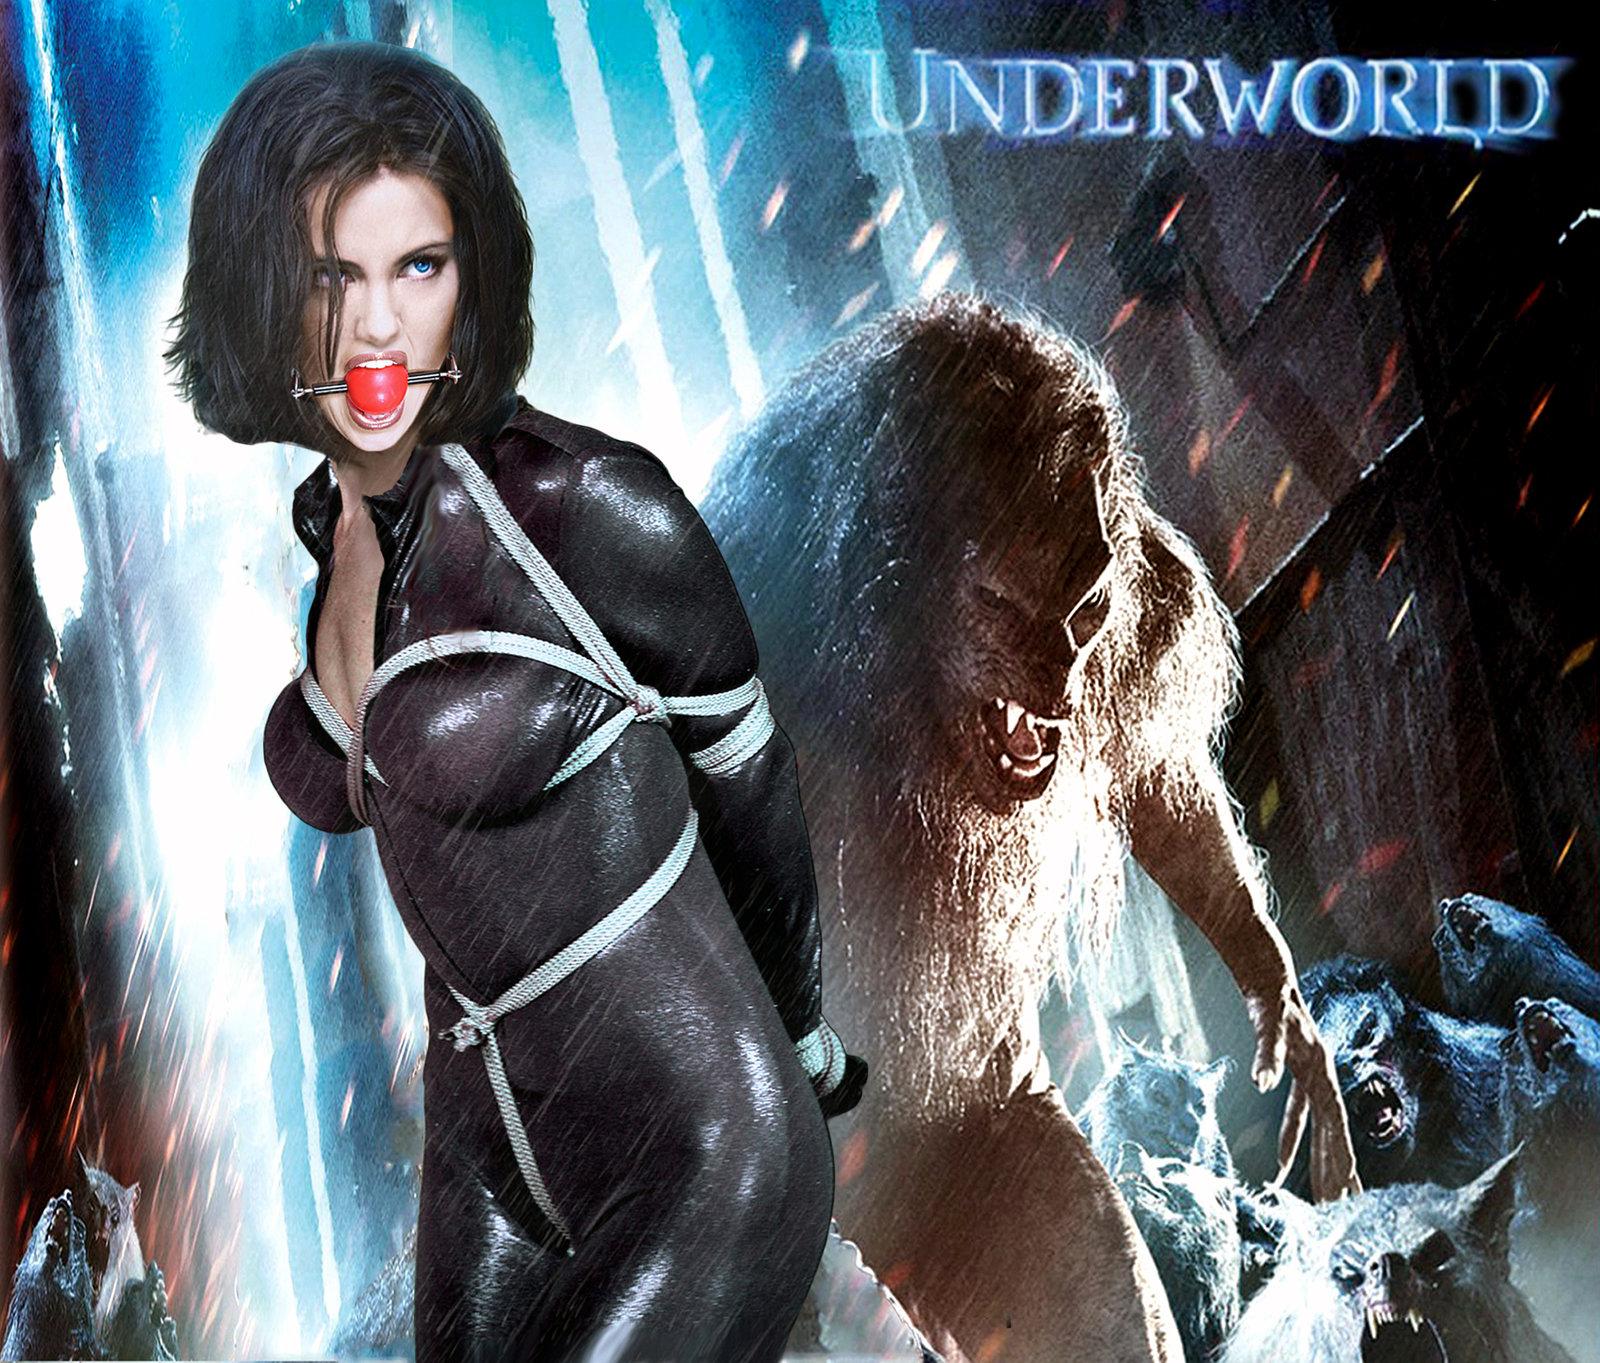 Lara croft of the underworld underground nude xxx photo